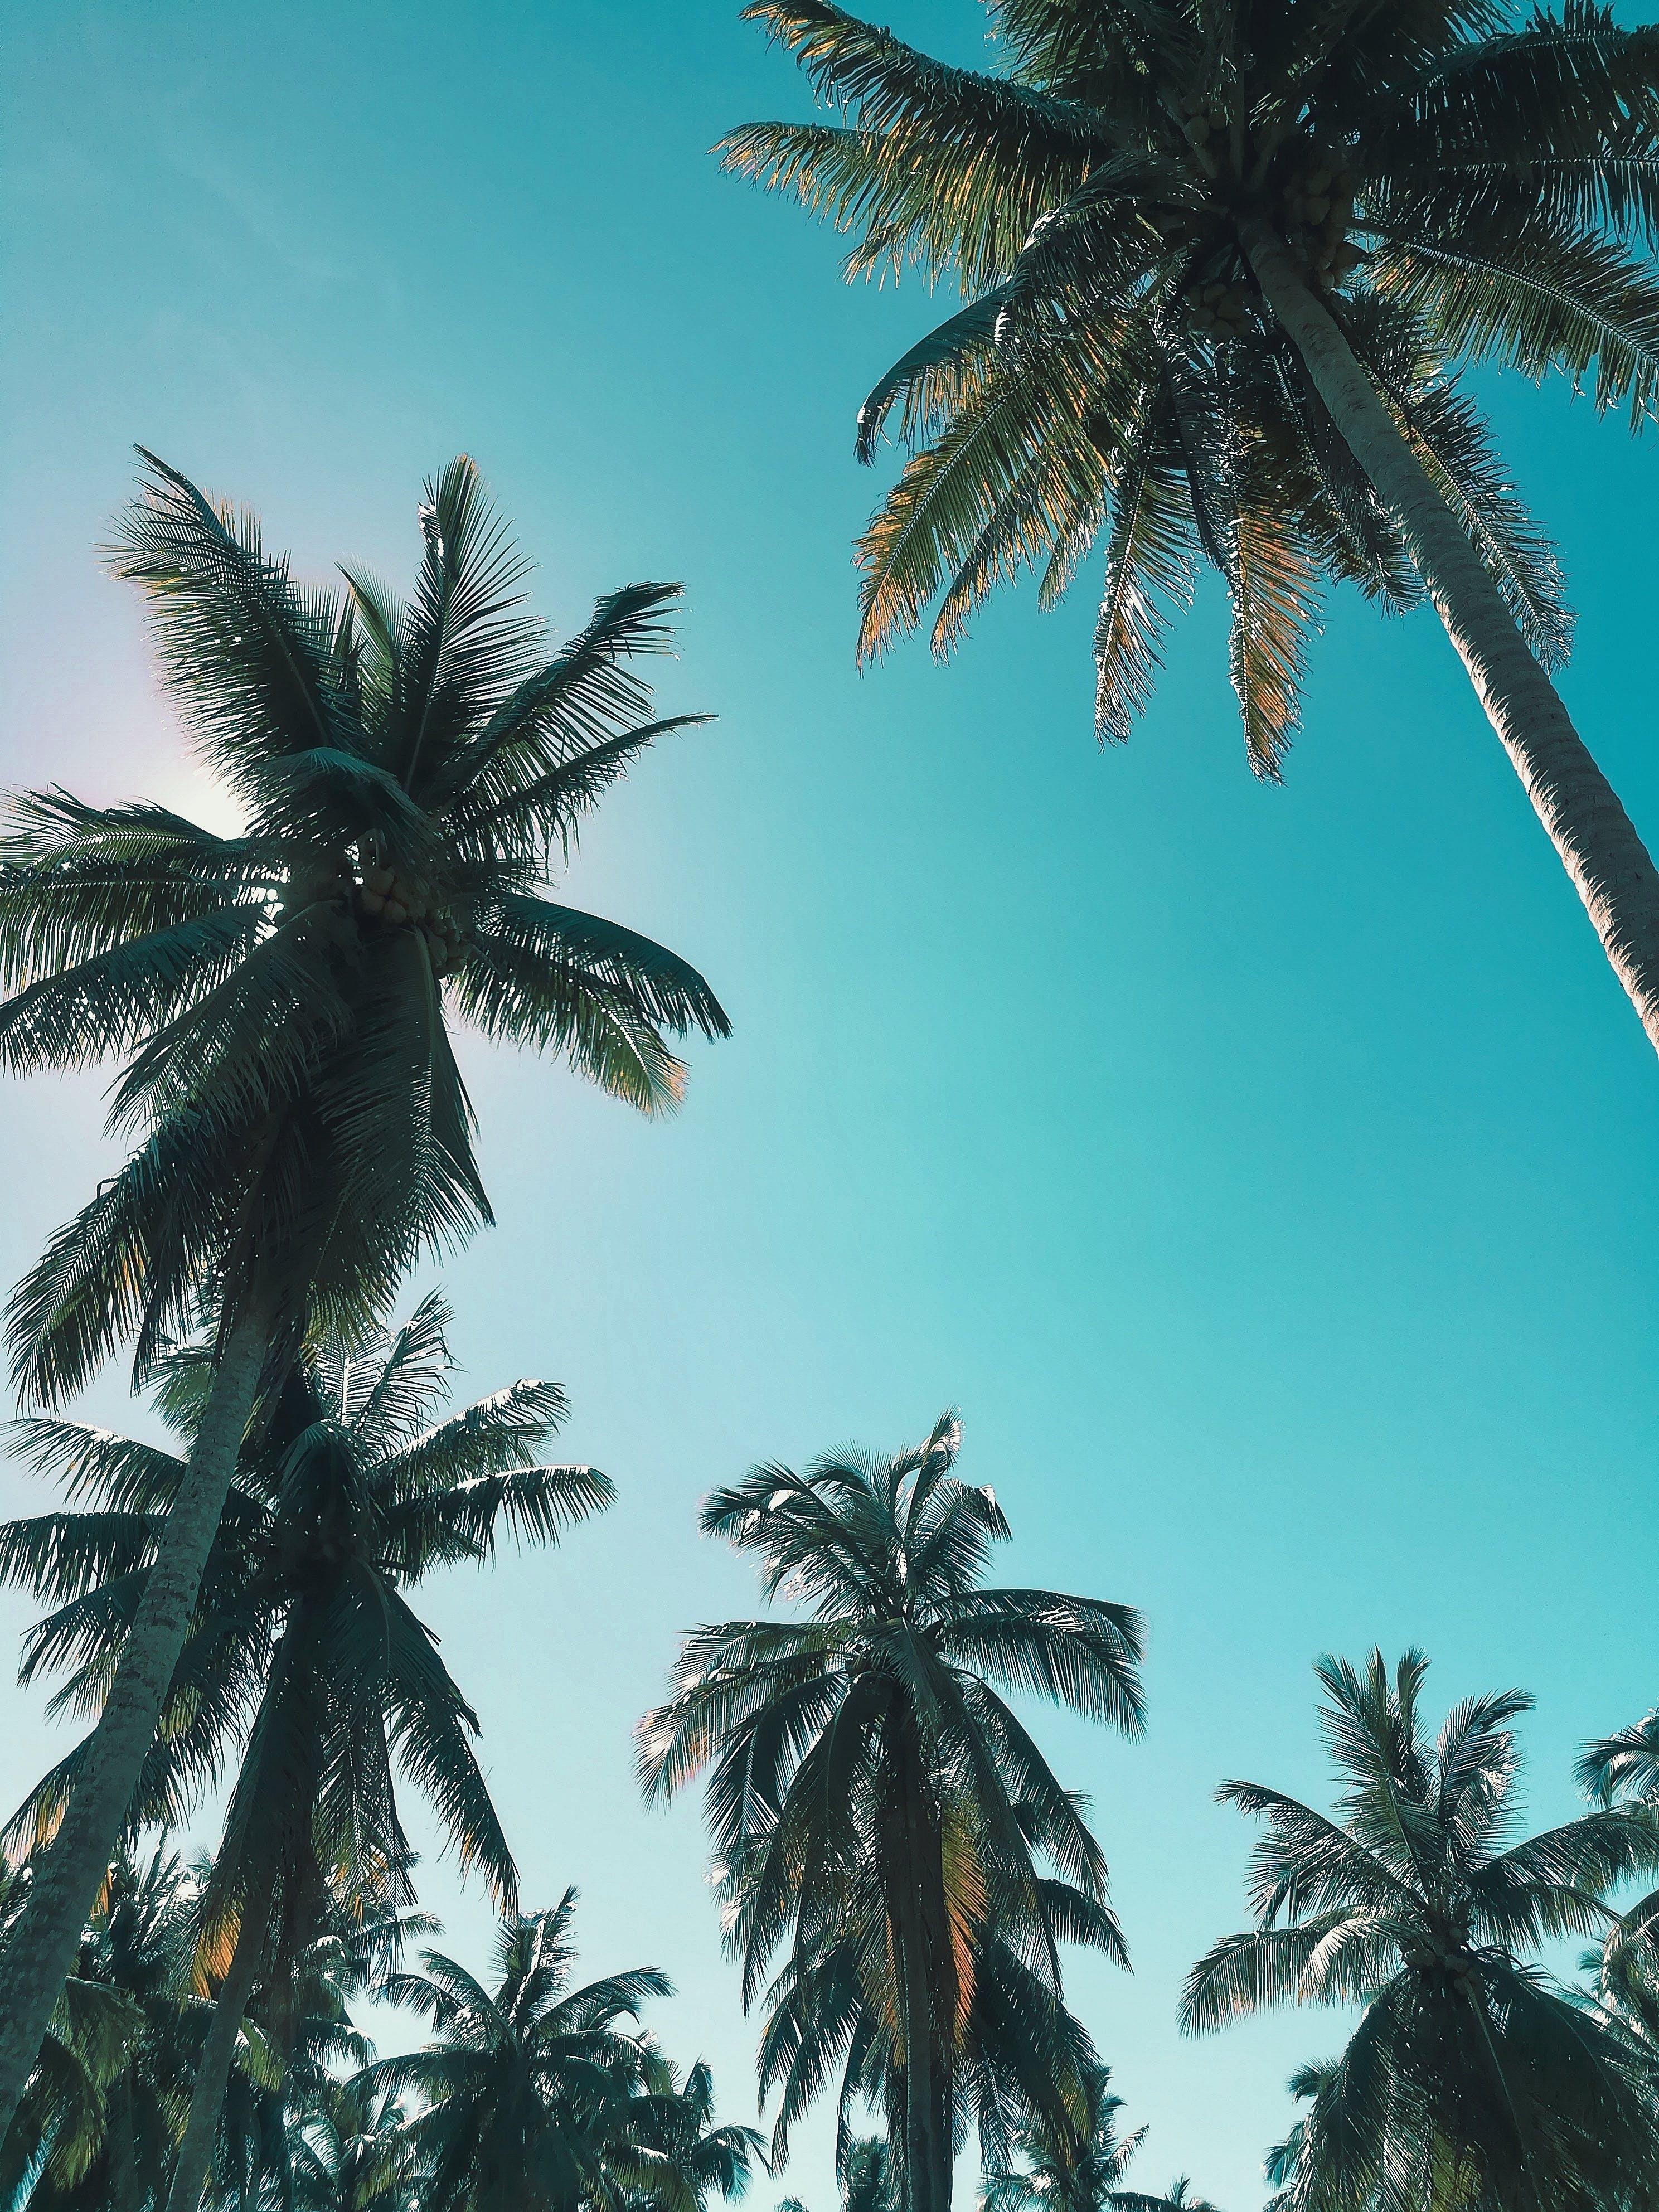 Kostenloses Stock Foto zu aufnahme von unten, bäume, kokosnussbäume, palmen